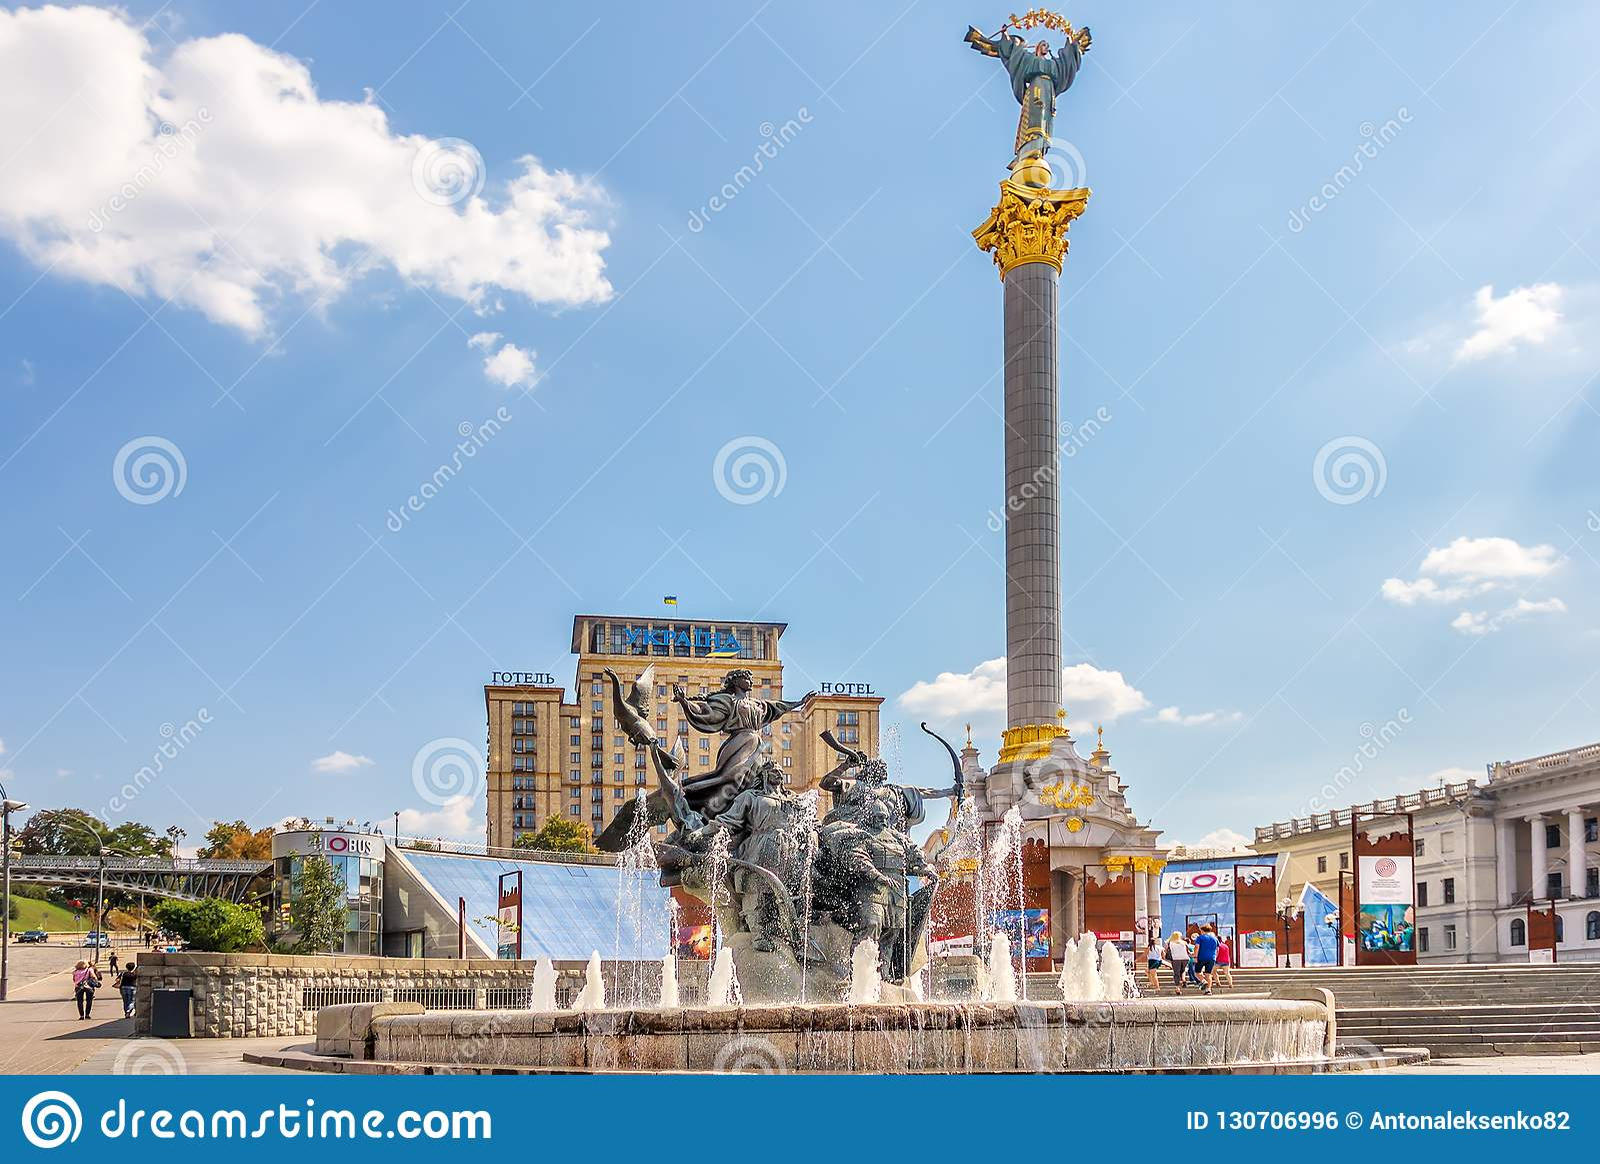 Kiev Ukraina - Augusti 15, 2018: Självständighetmonument i Maidan i Kiev, minnes- utställning till Euromaidan